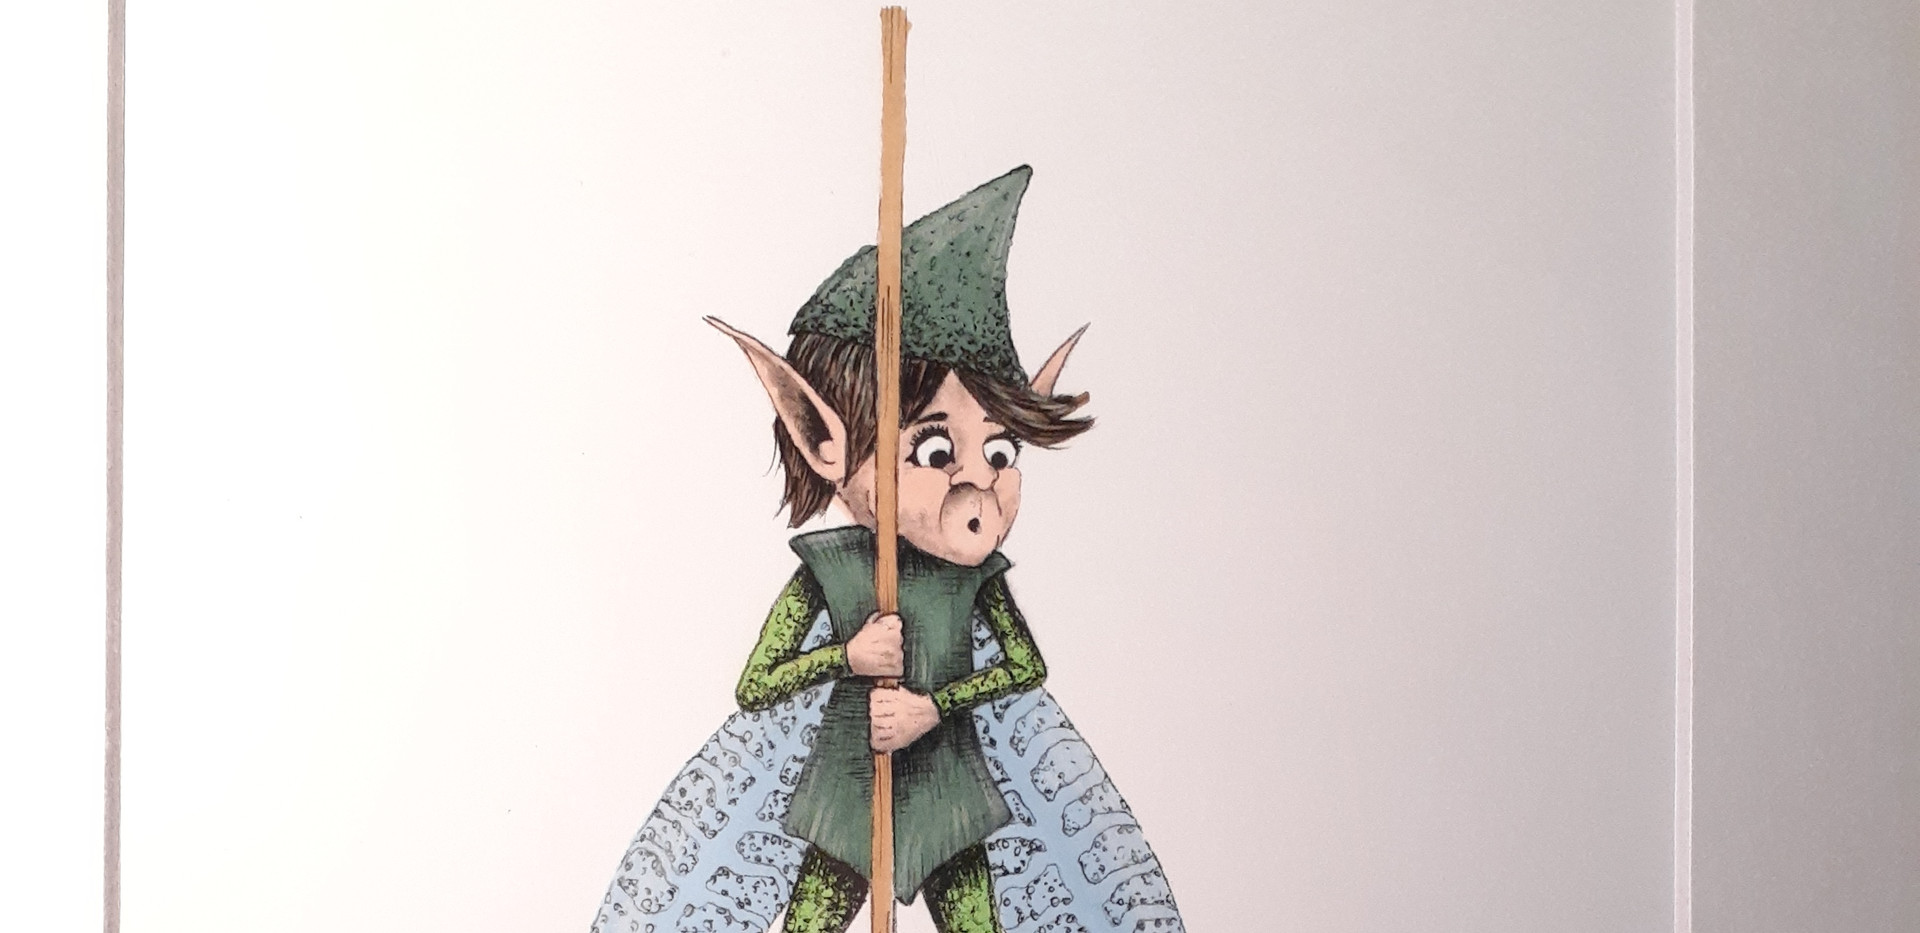 Original Illustrations by Dave Rozmarynowski